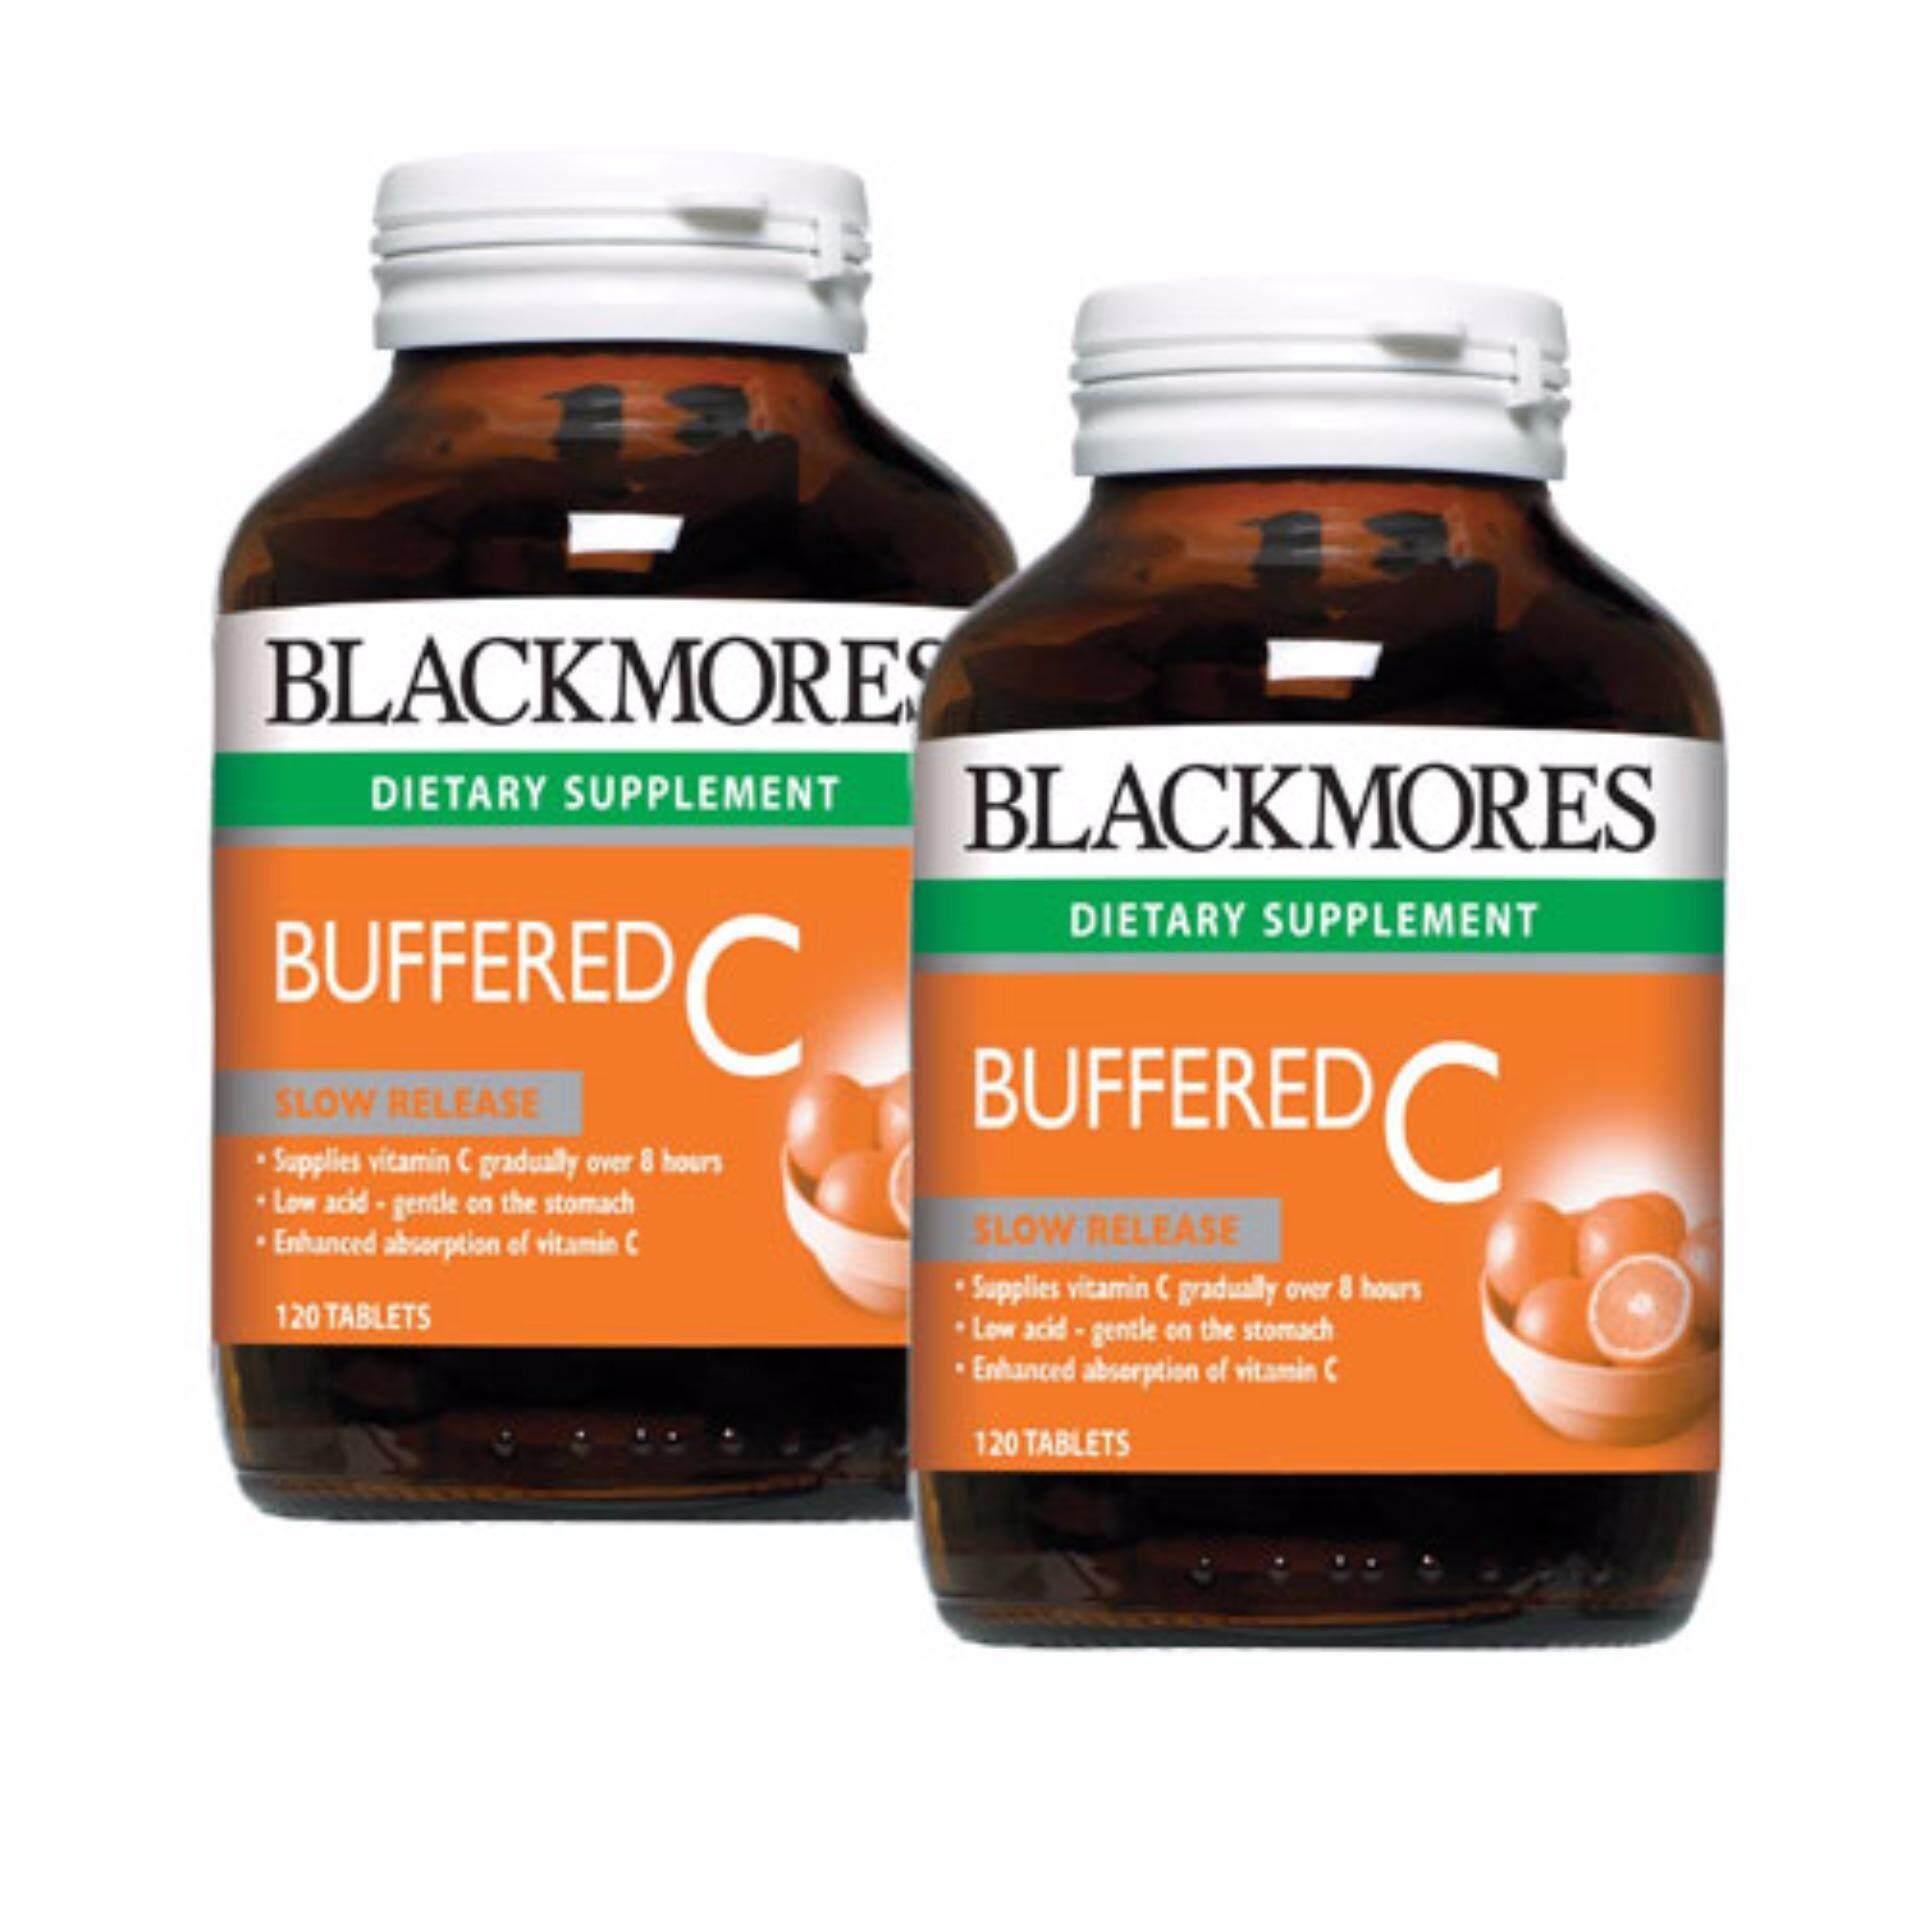 Blackmores Buffered C 120's x 2bottles